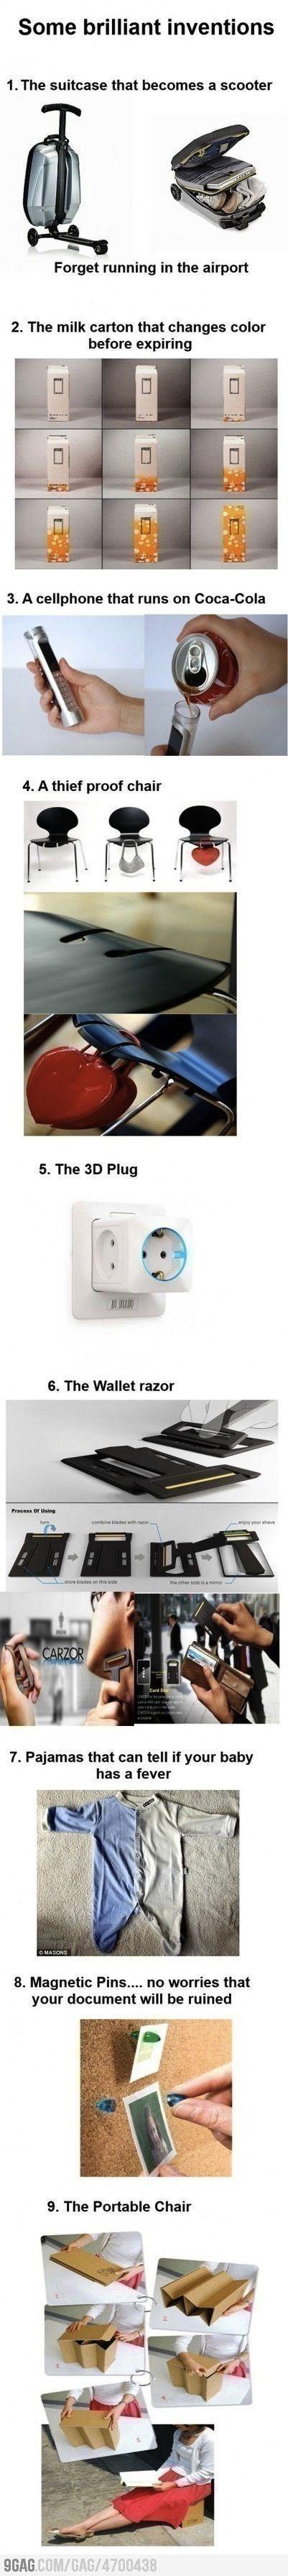 Some brilliant inventions